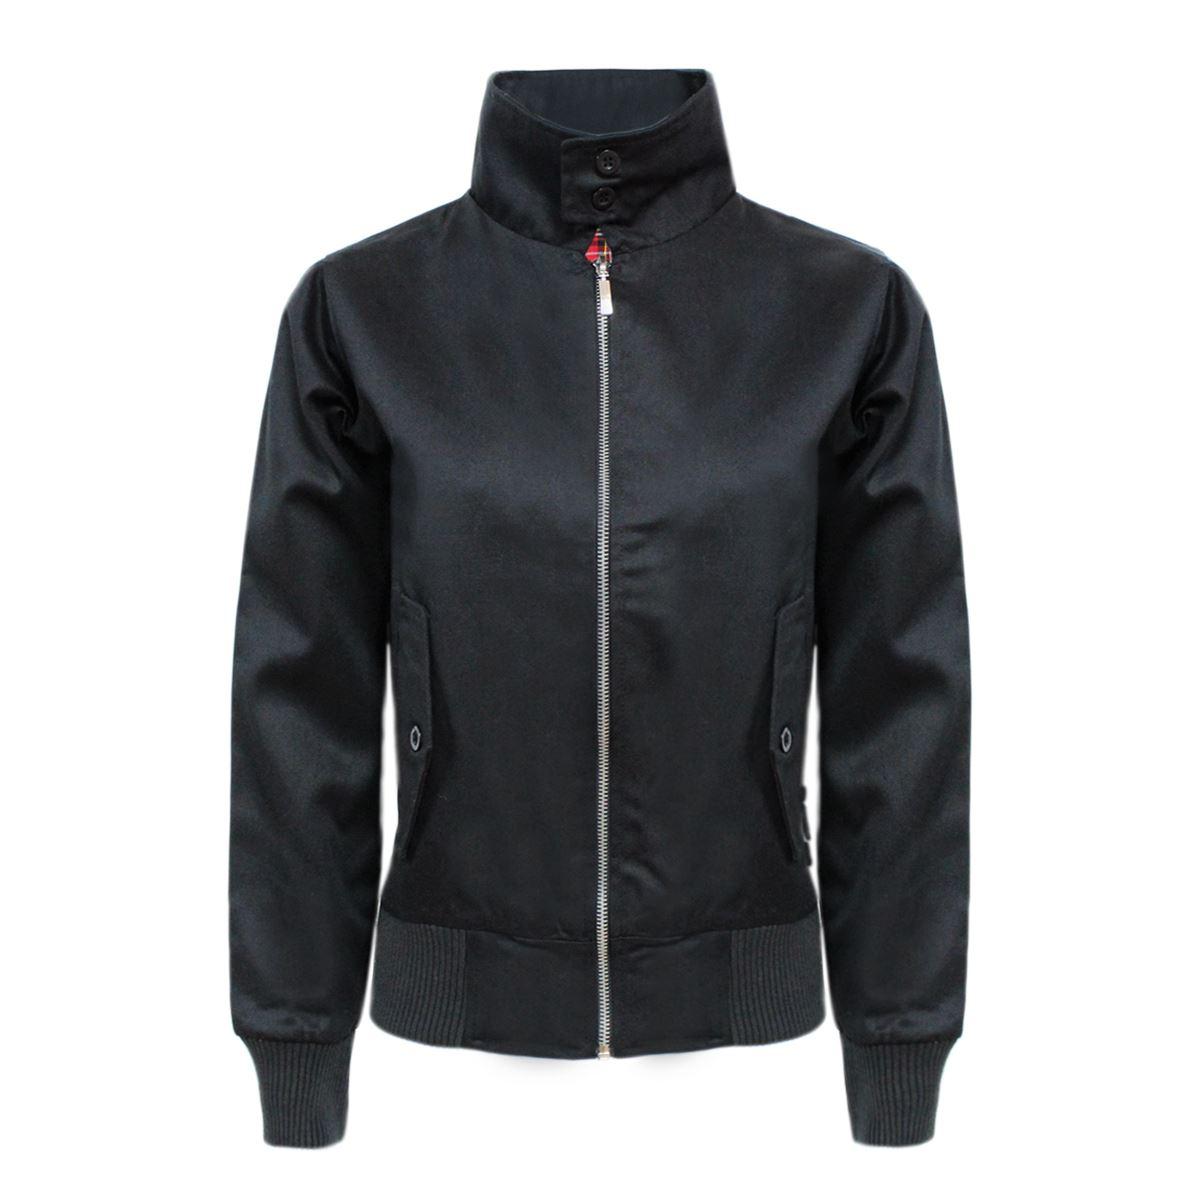 Ladies black lightweight jacket